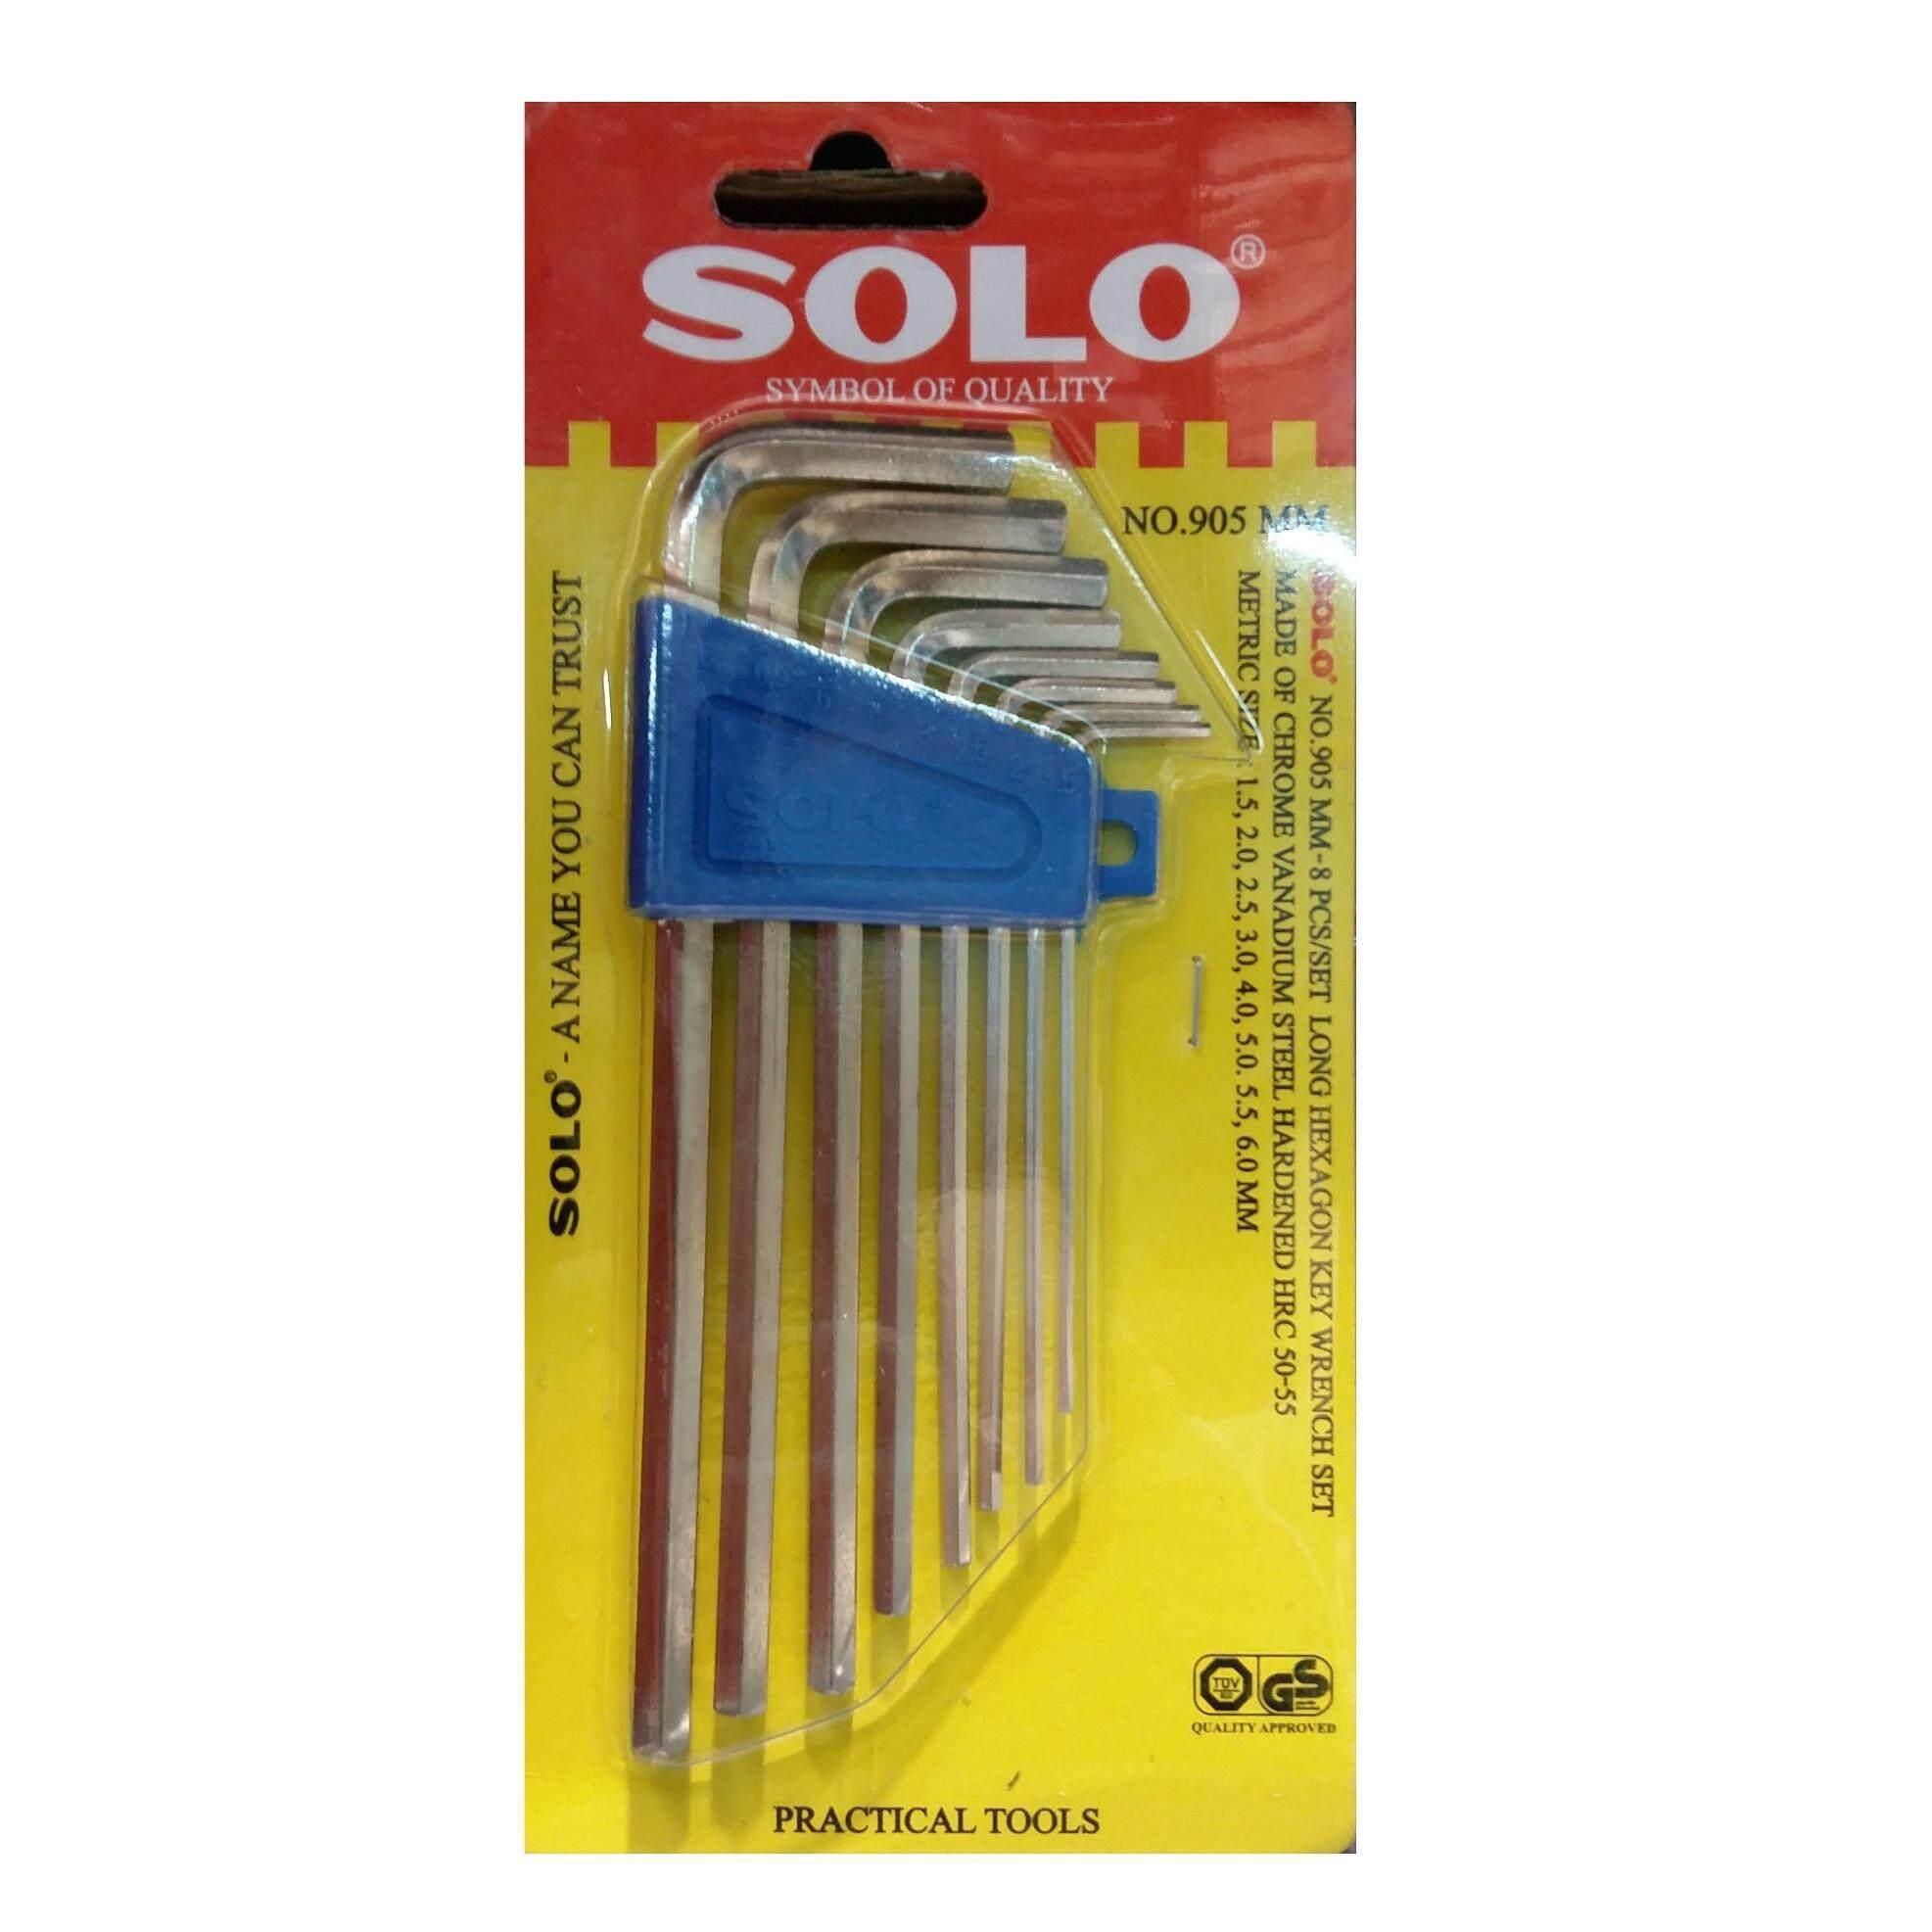 Solo โซโล ประแจหกเหลี่ยมชุบขาวแบบยาว Cr-V รุ่น 905 (8ตัว/ชุด) By Voraphan.